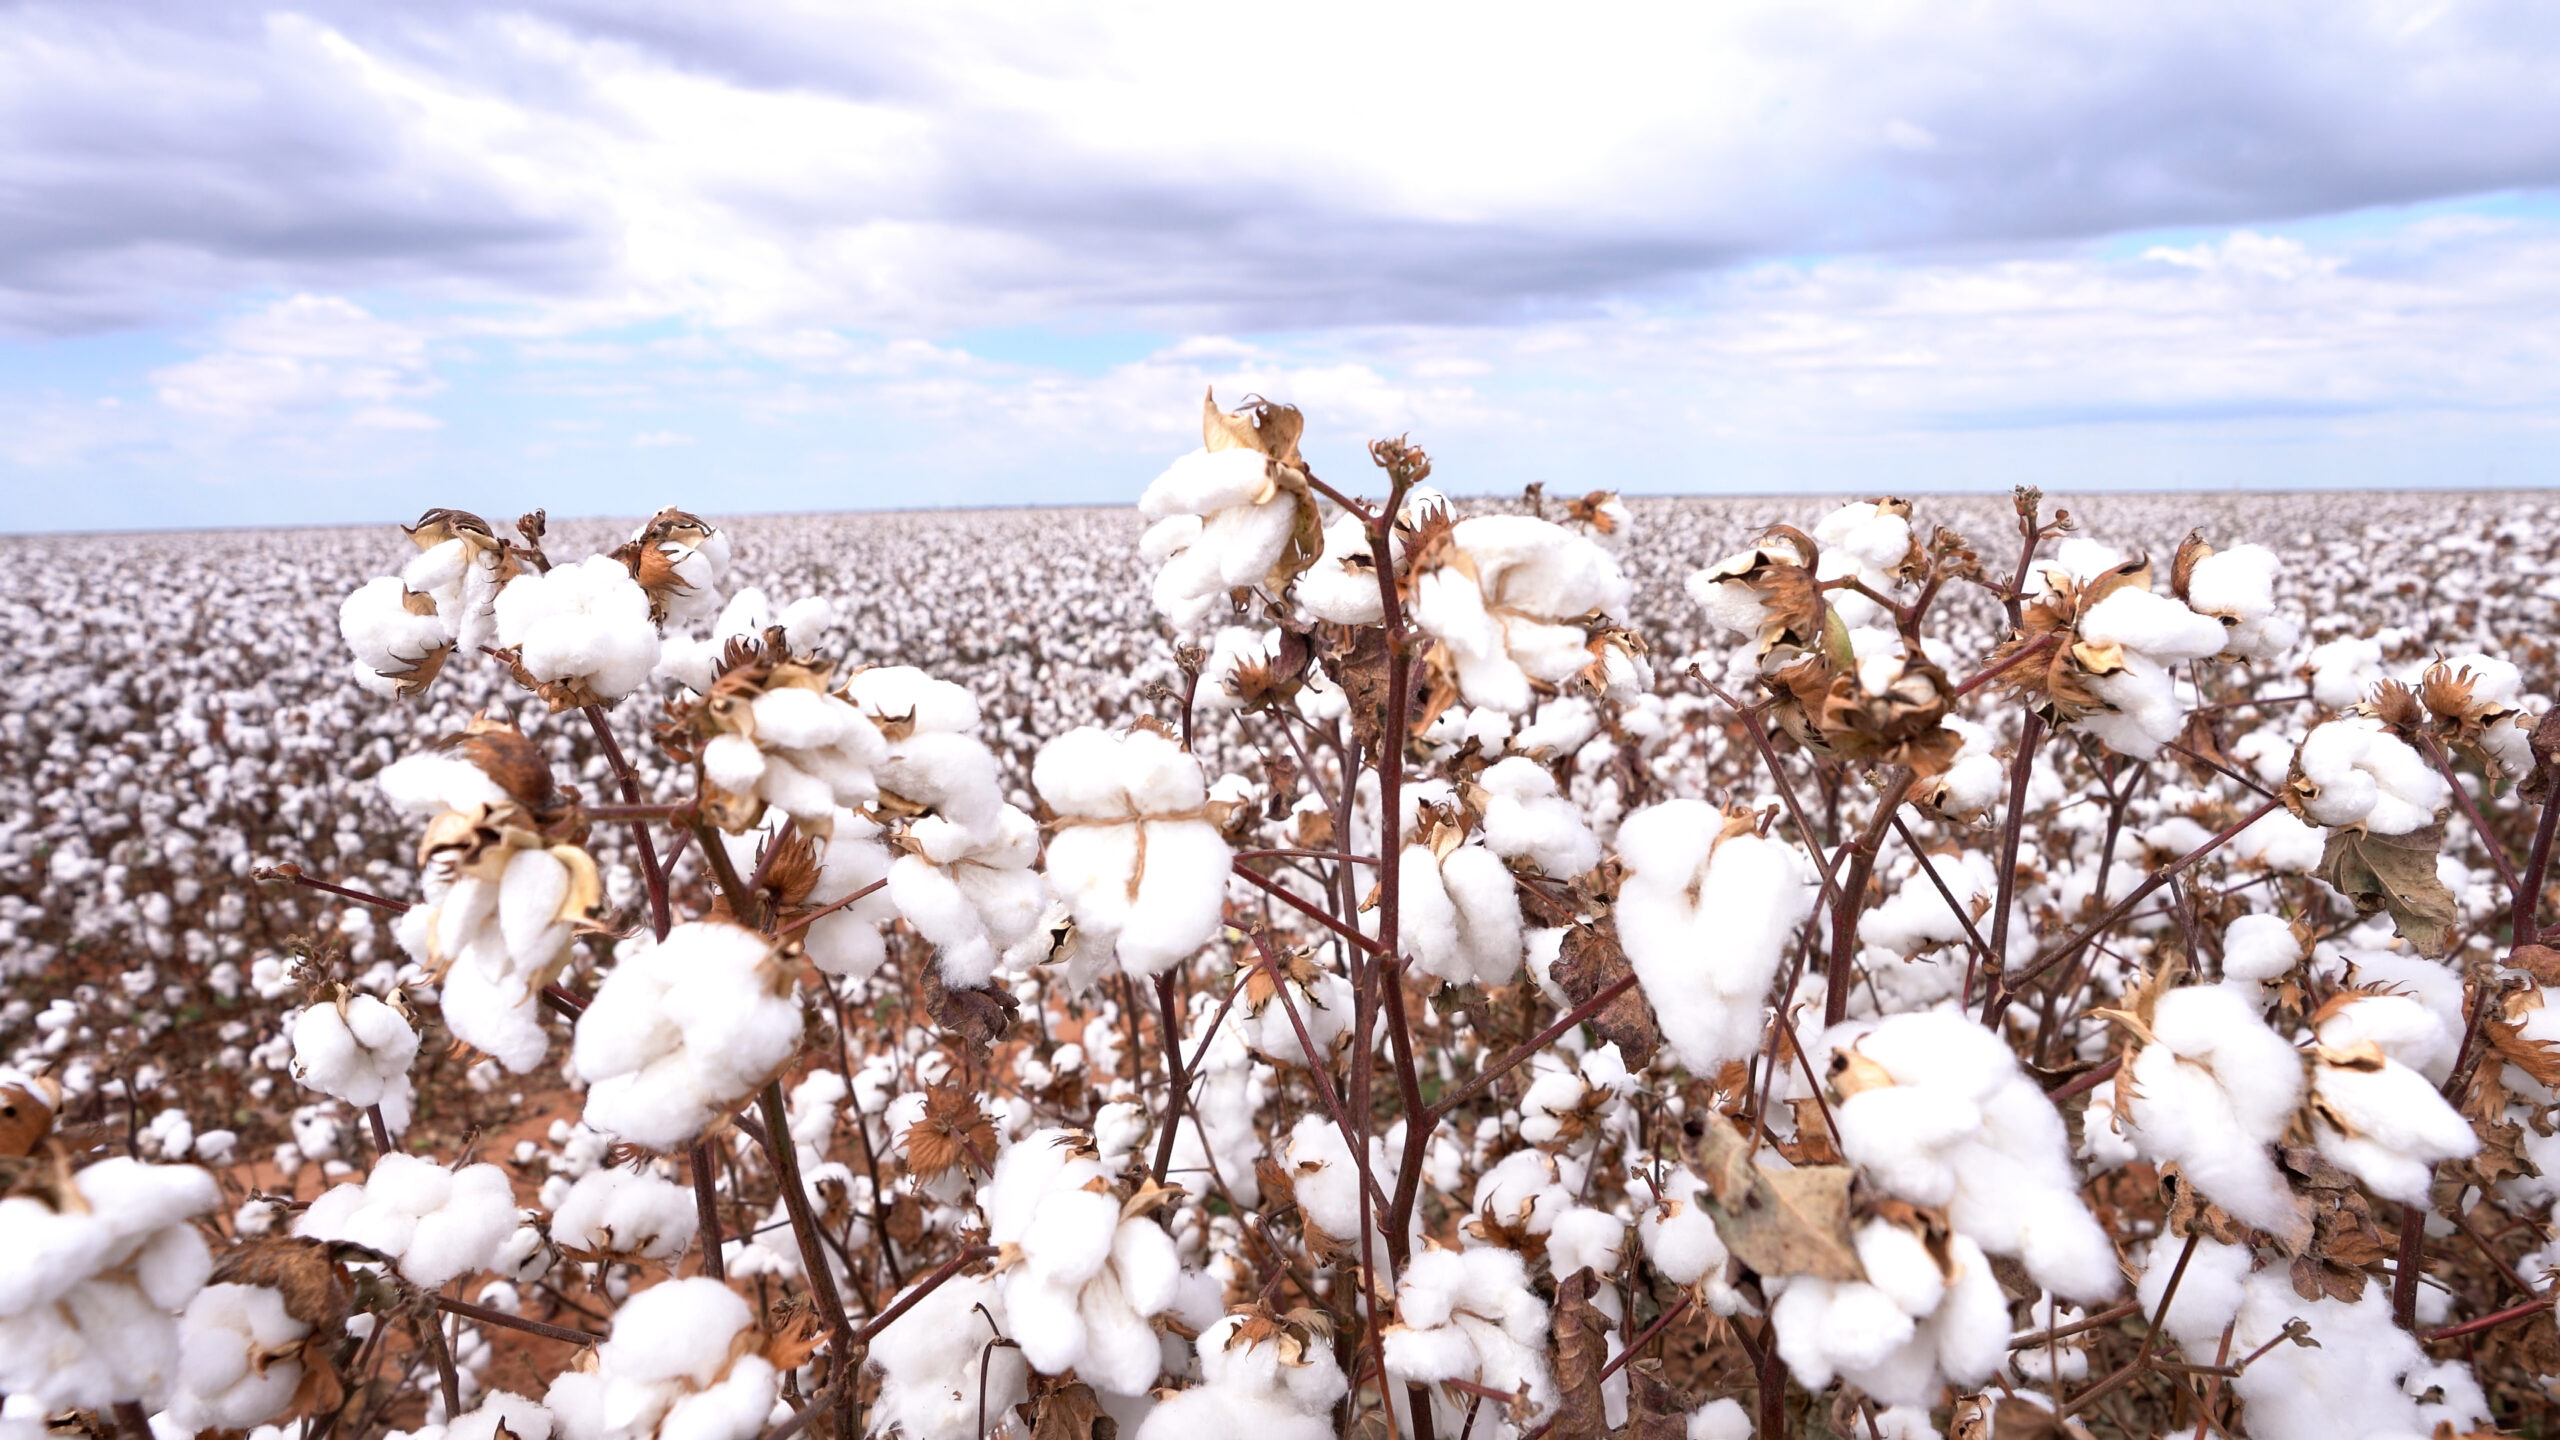 algodão bollgard bayer, biotecnologia